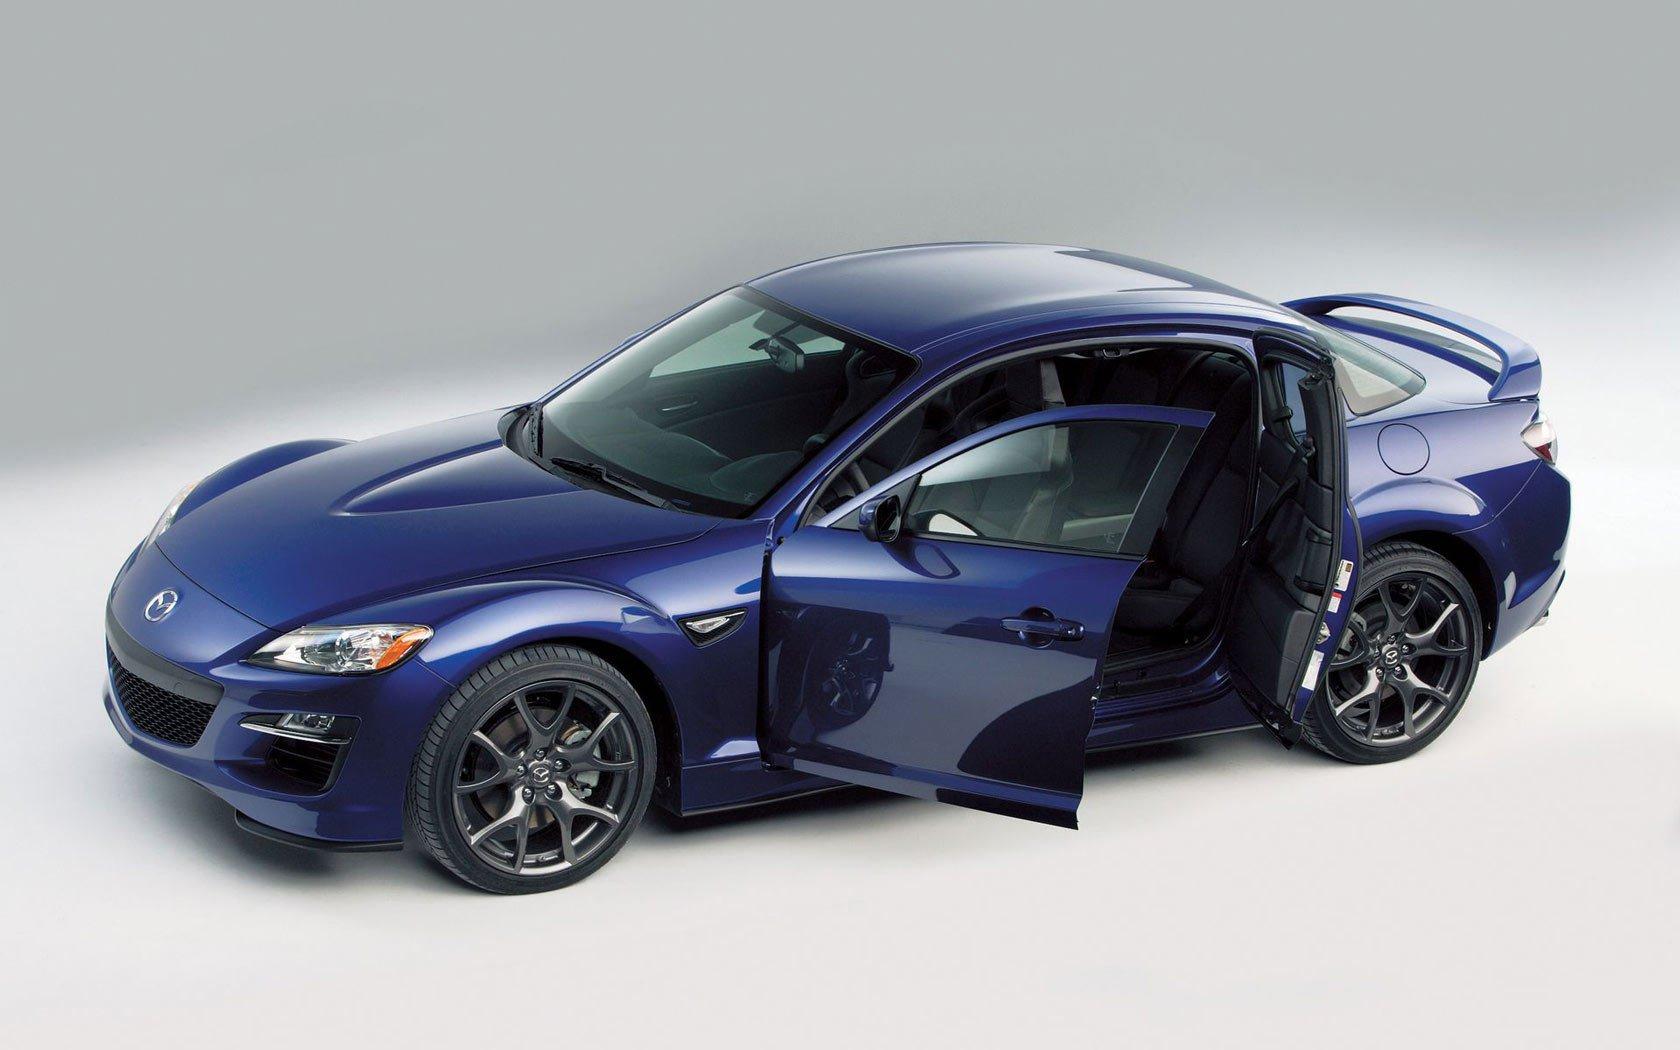 Mazda_rx-8_r3_7411_1680x1050